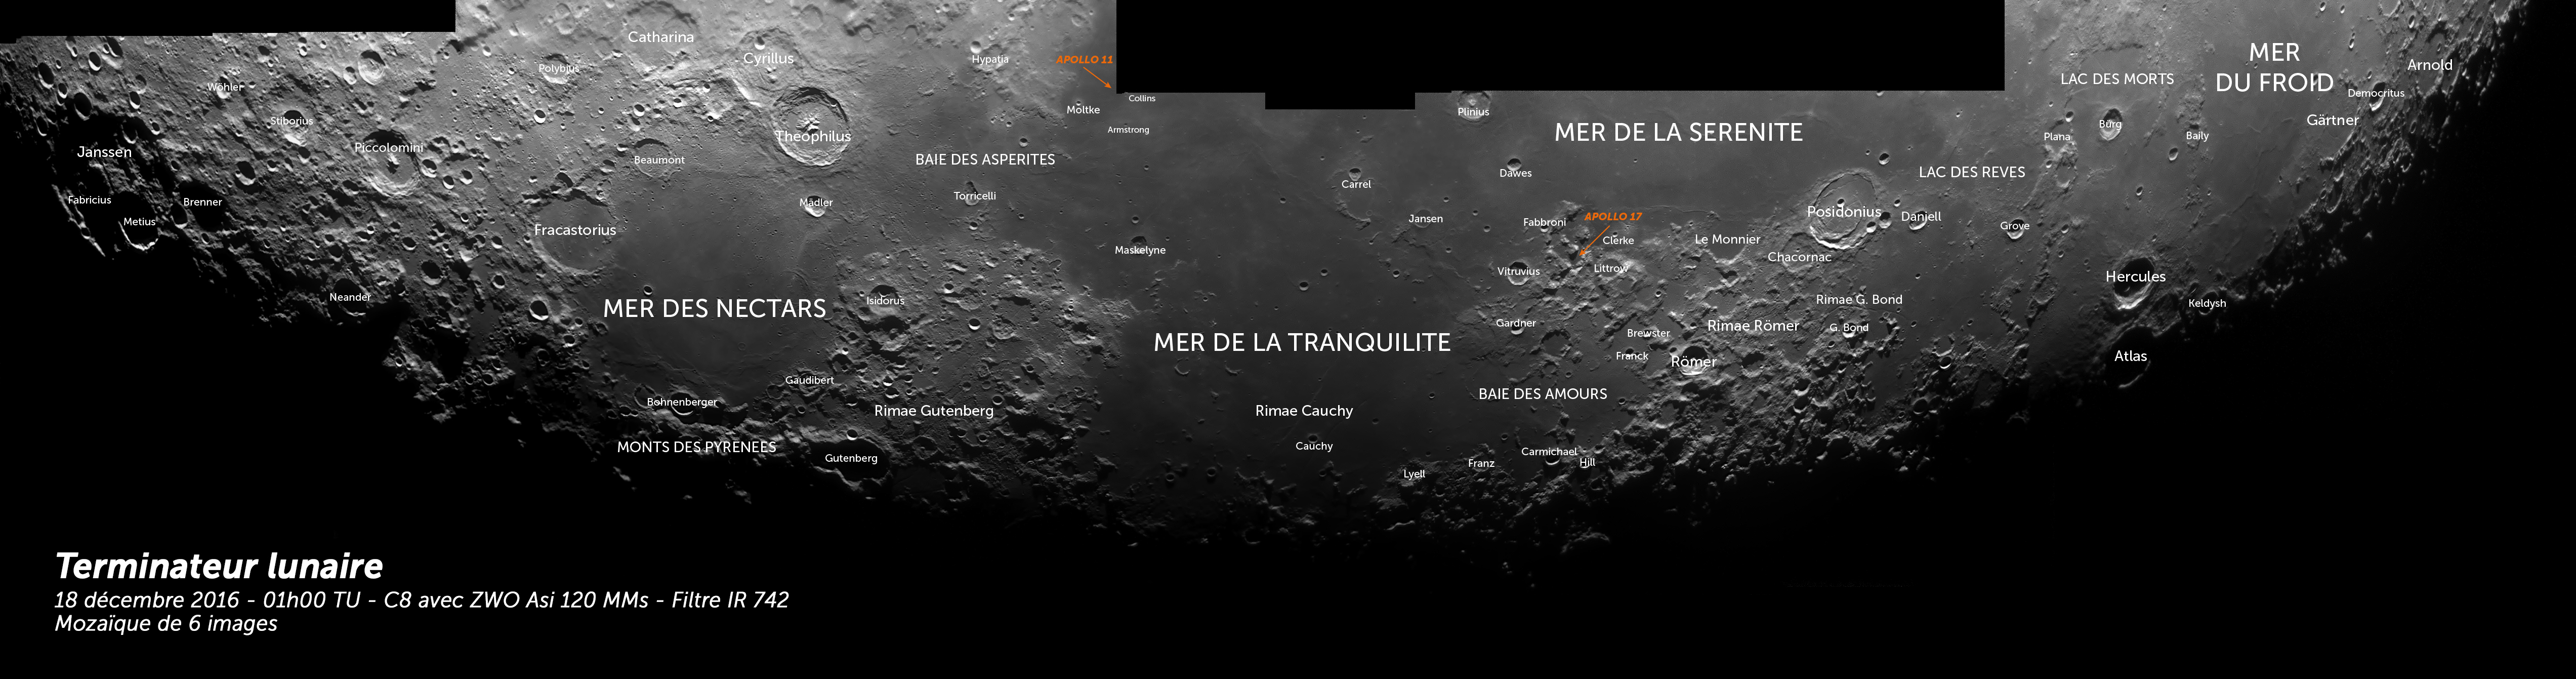 lune-terminateur-20161218-ok-fusion-note